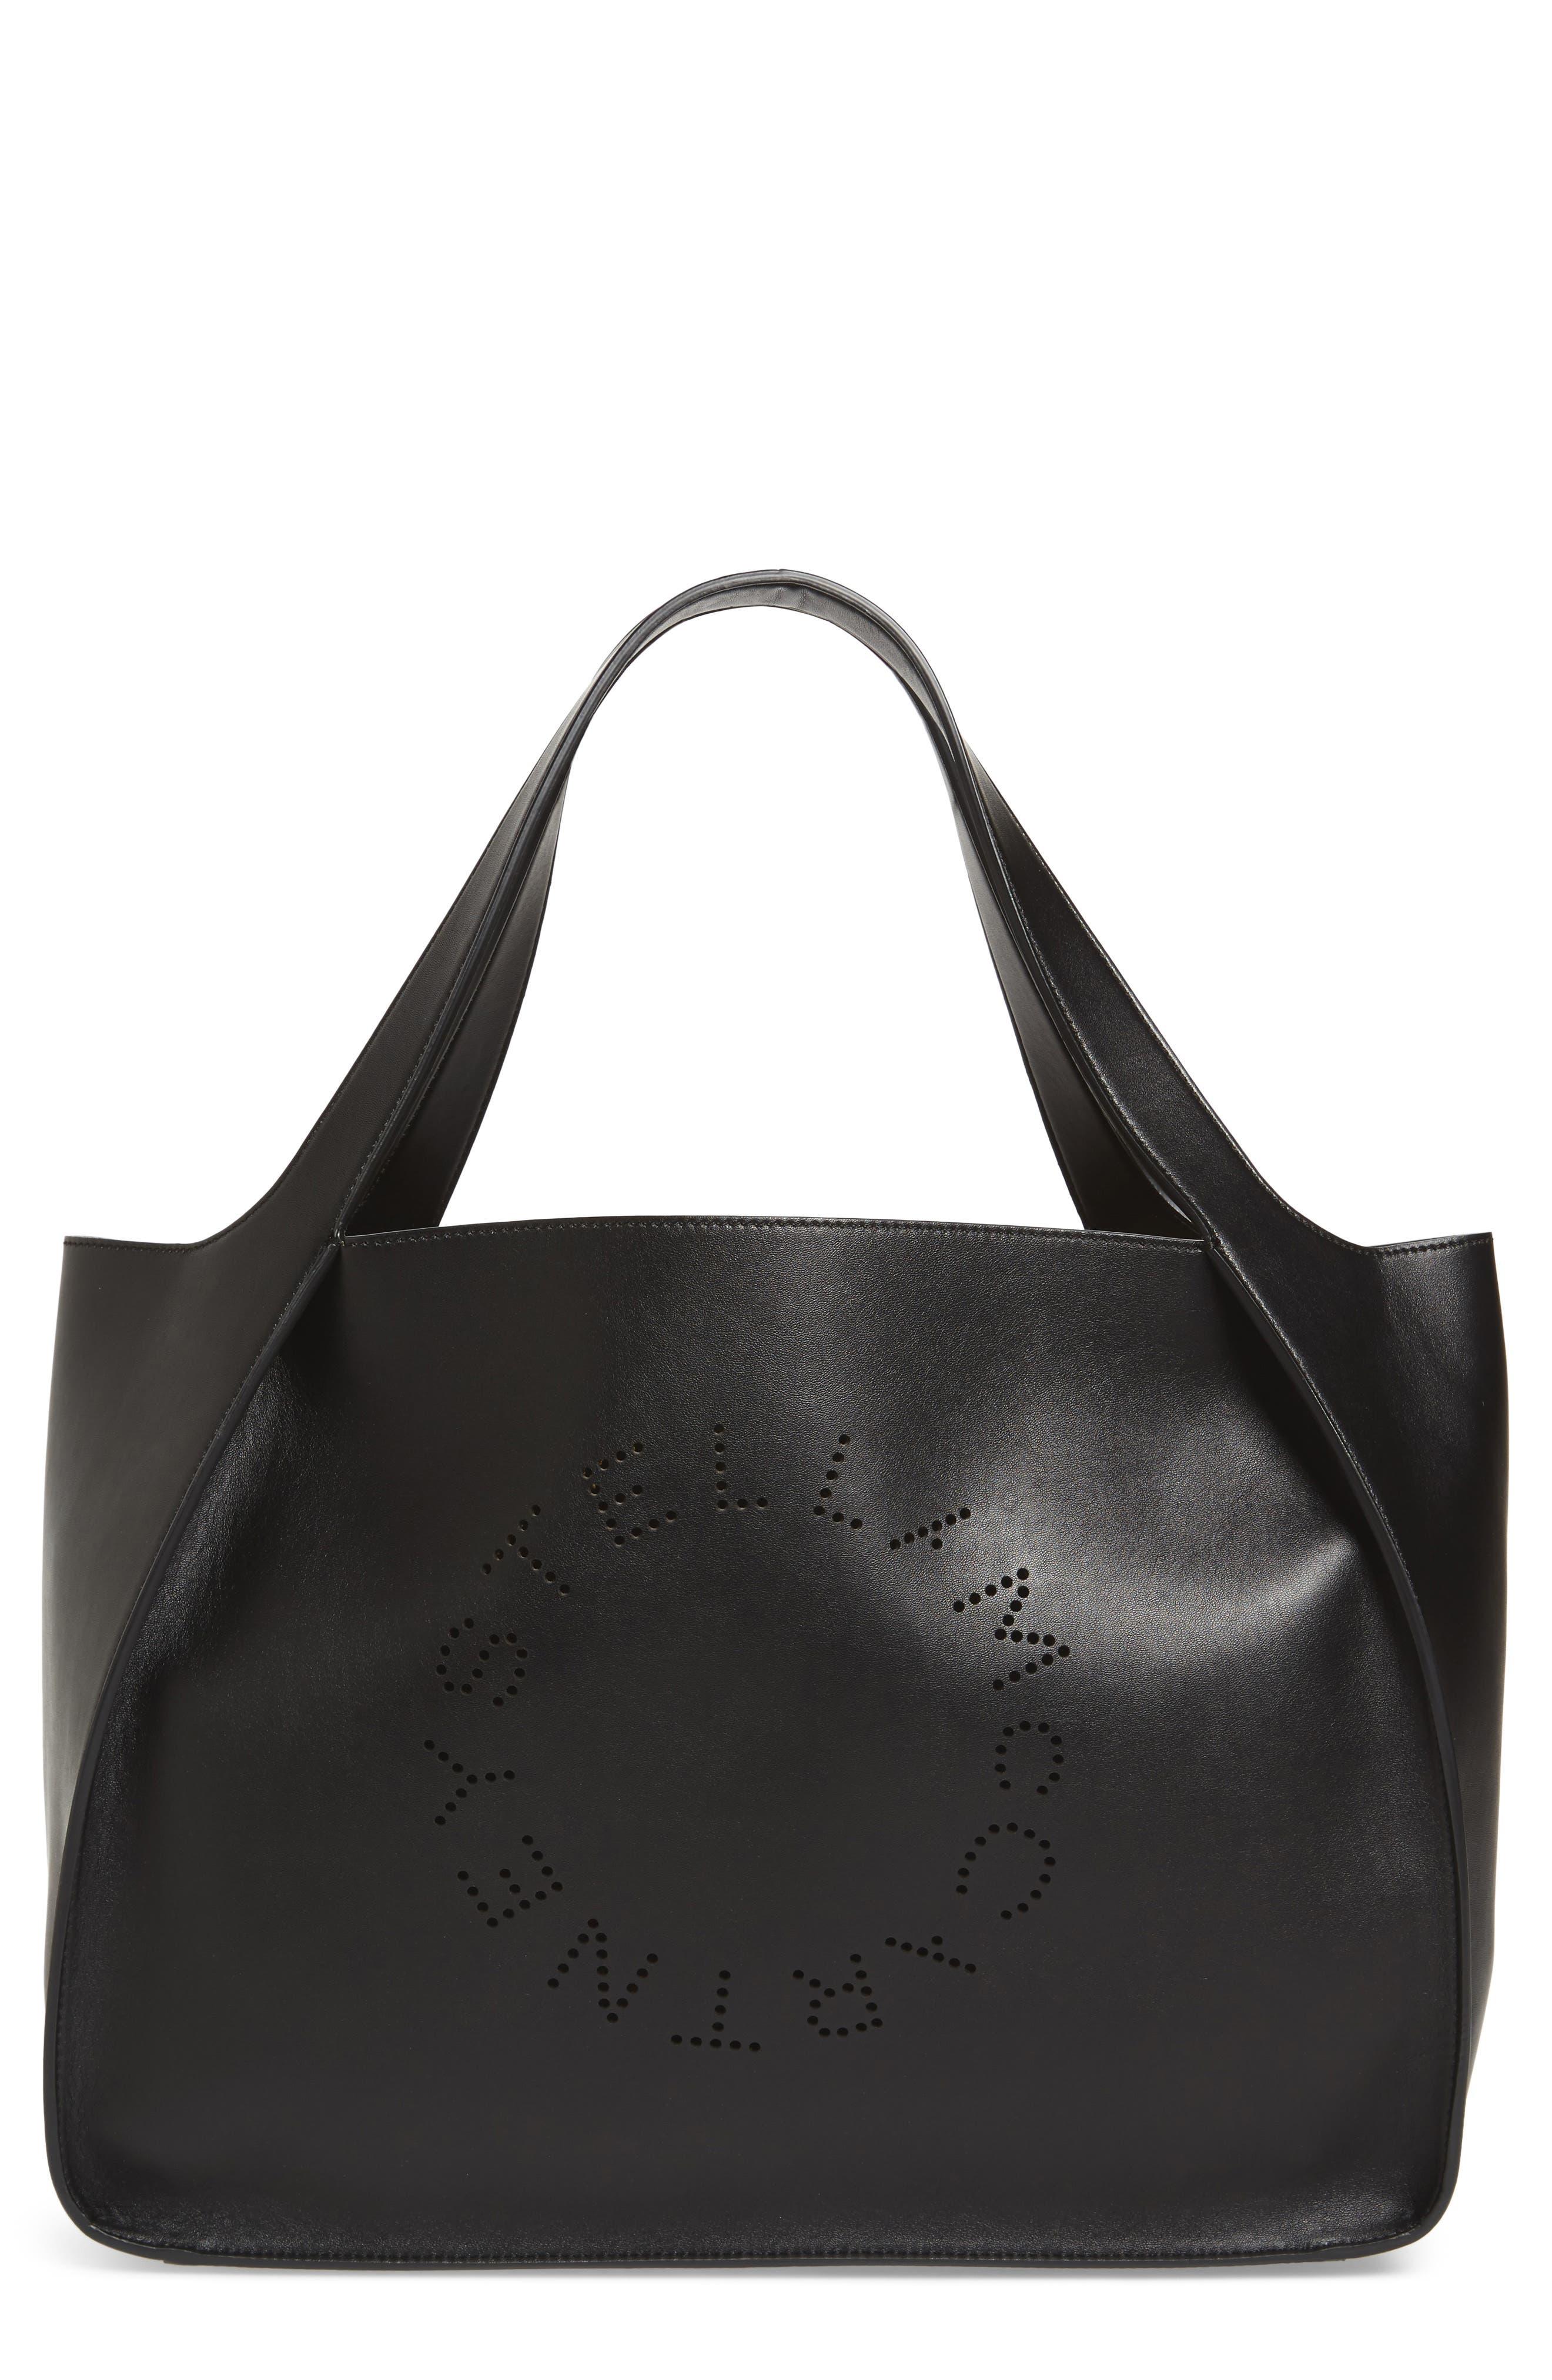 Alternate Image 1 Selected - Stella McCartney Medium Perforated Logo Faux Leather Tote